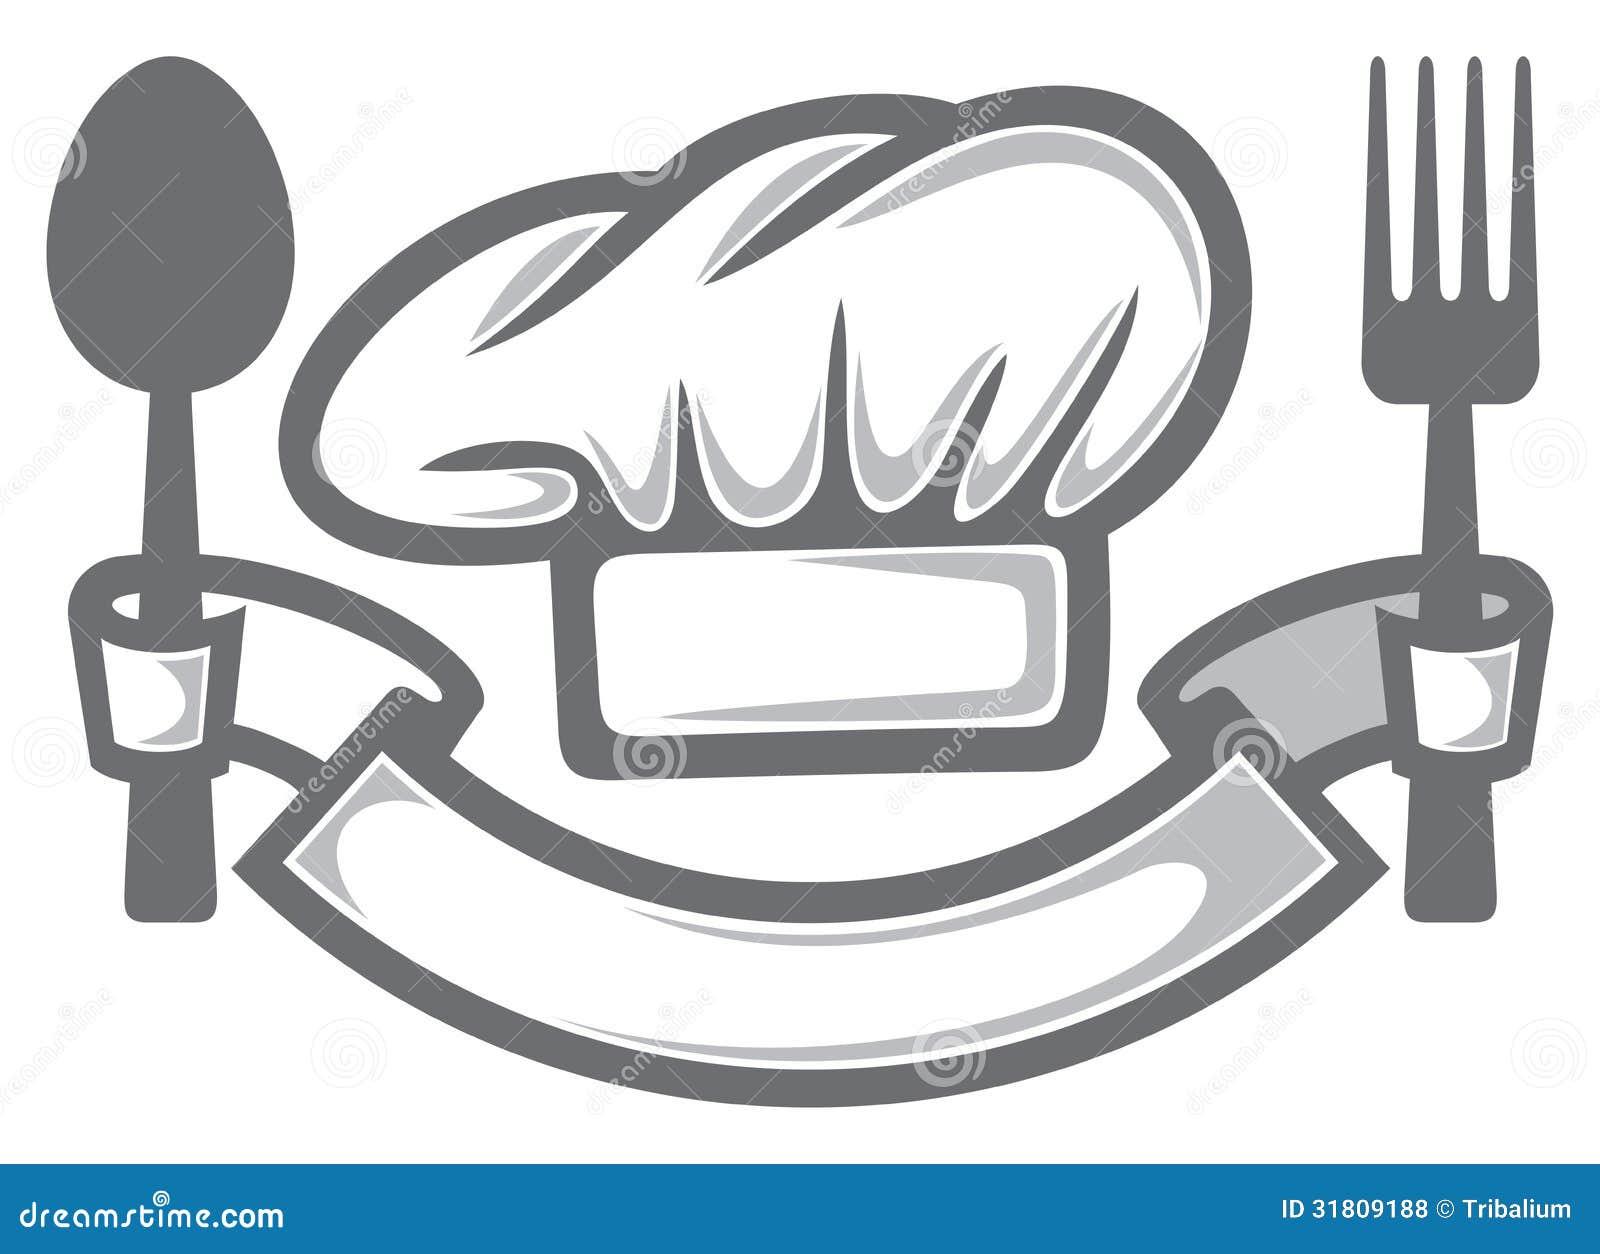 restaurant symbols clip art - photo #40